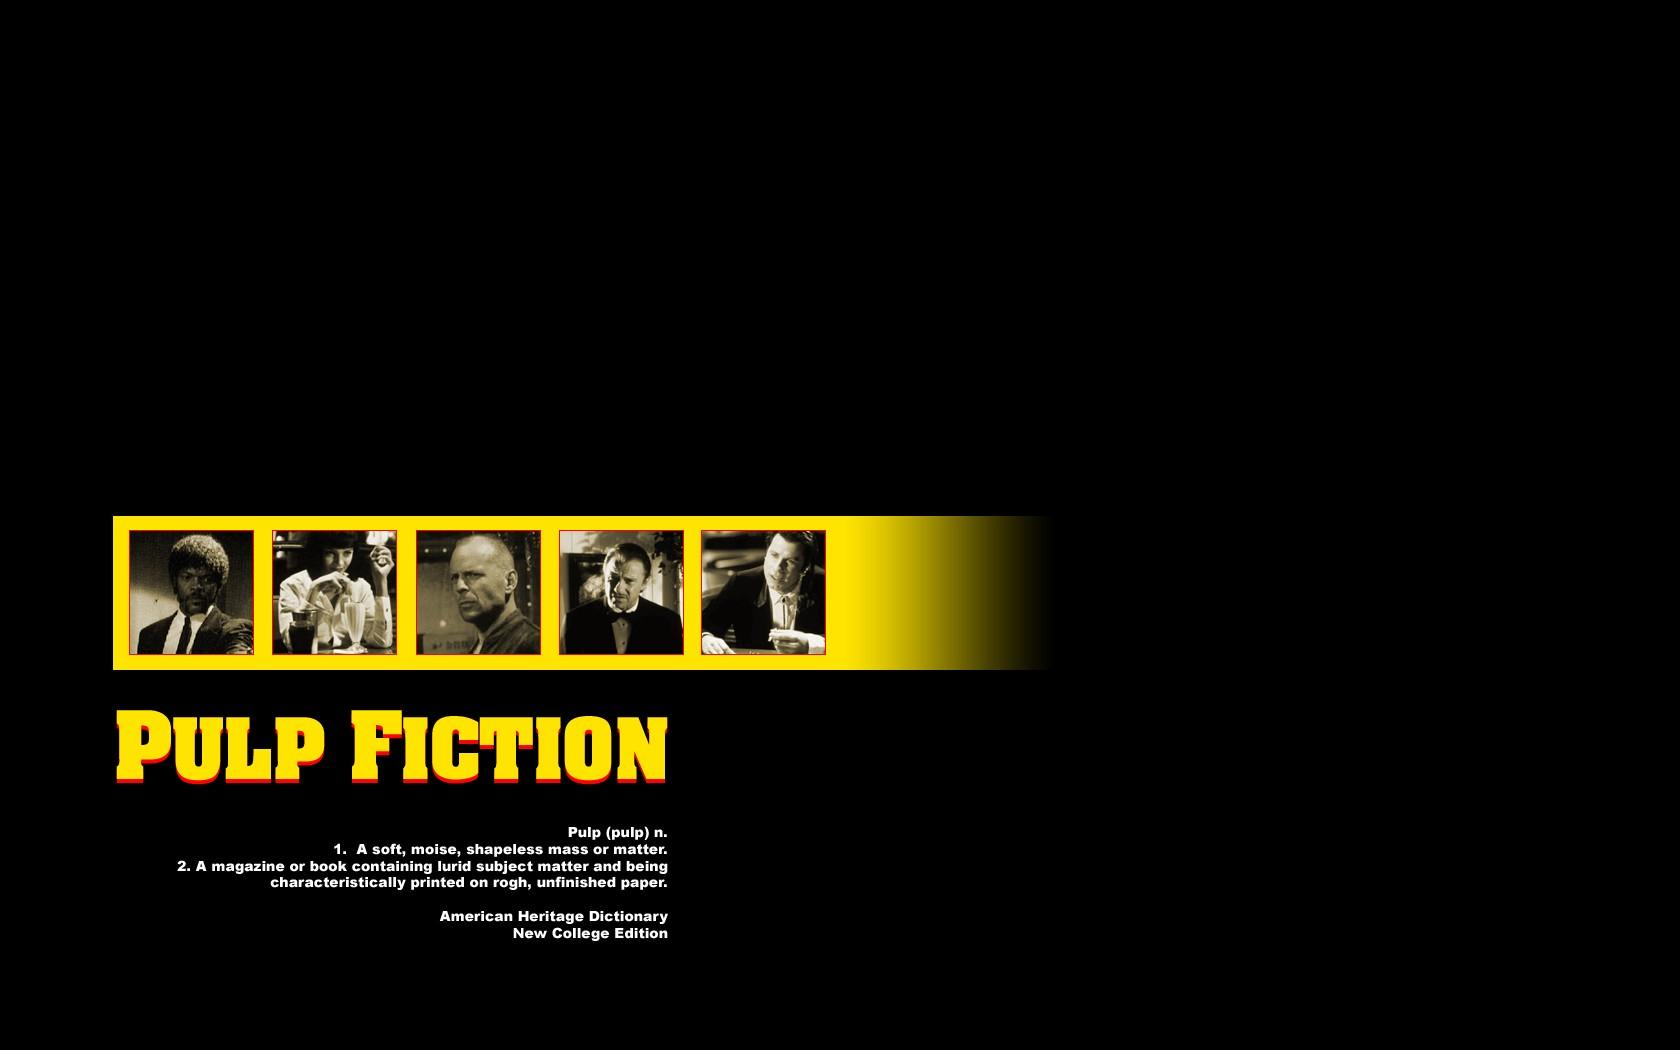 General 1680x1050 Pulp Fiction Samuel L. Jackson Uma Thurman Bruce Willis John Travolta Harvey Keitel Quentin Tarantino